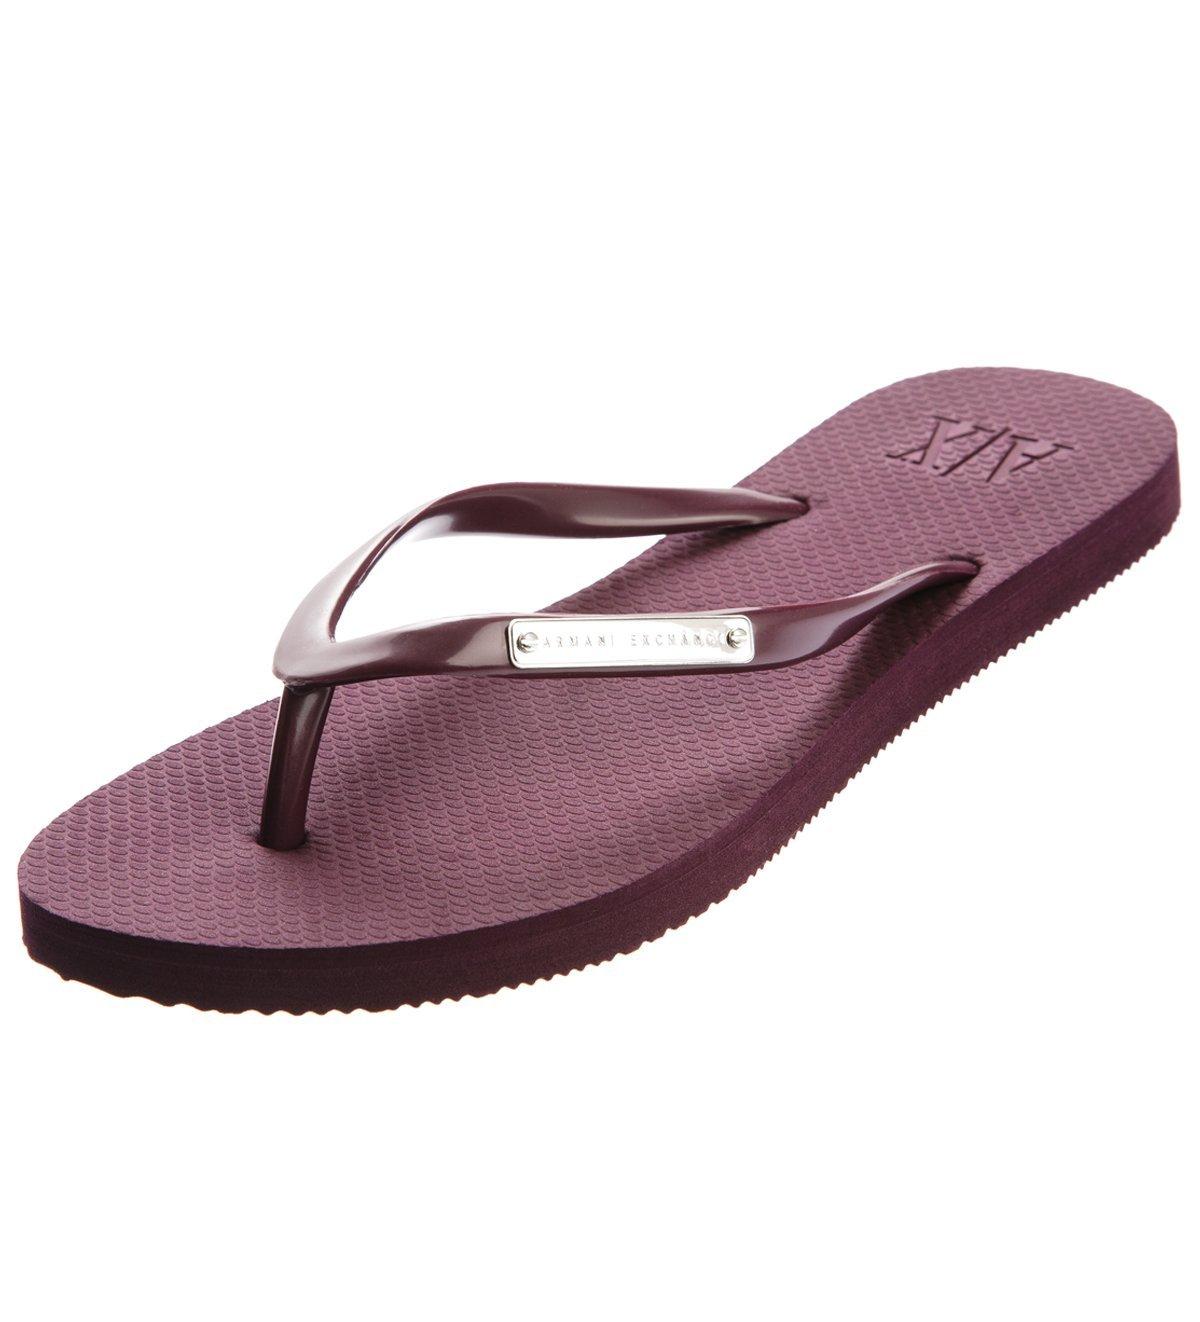 47eedfe85138ca Armani Exchange Logo Plate Flip Flop - Aubergine — Armani Shoes